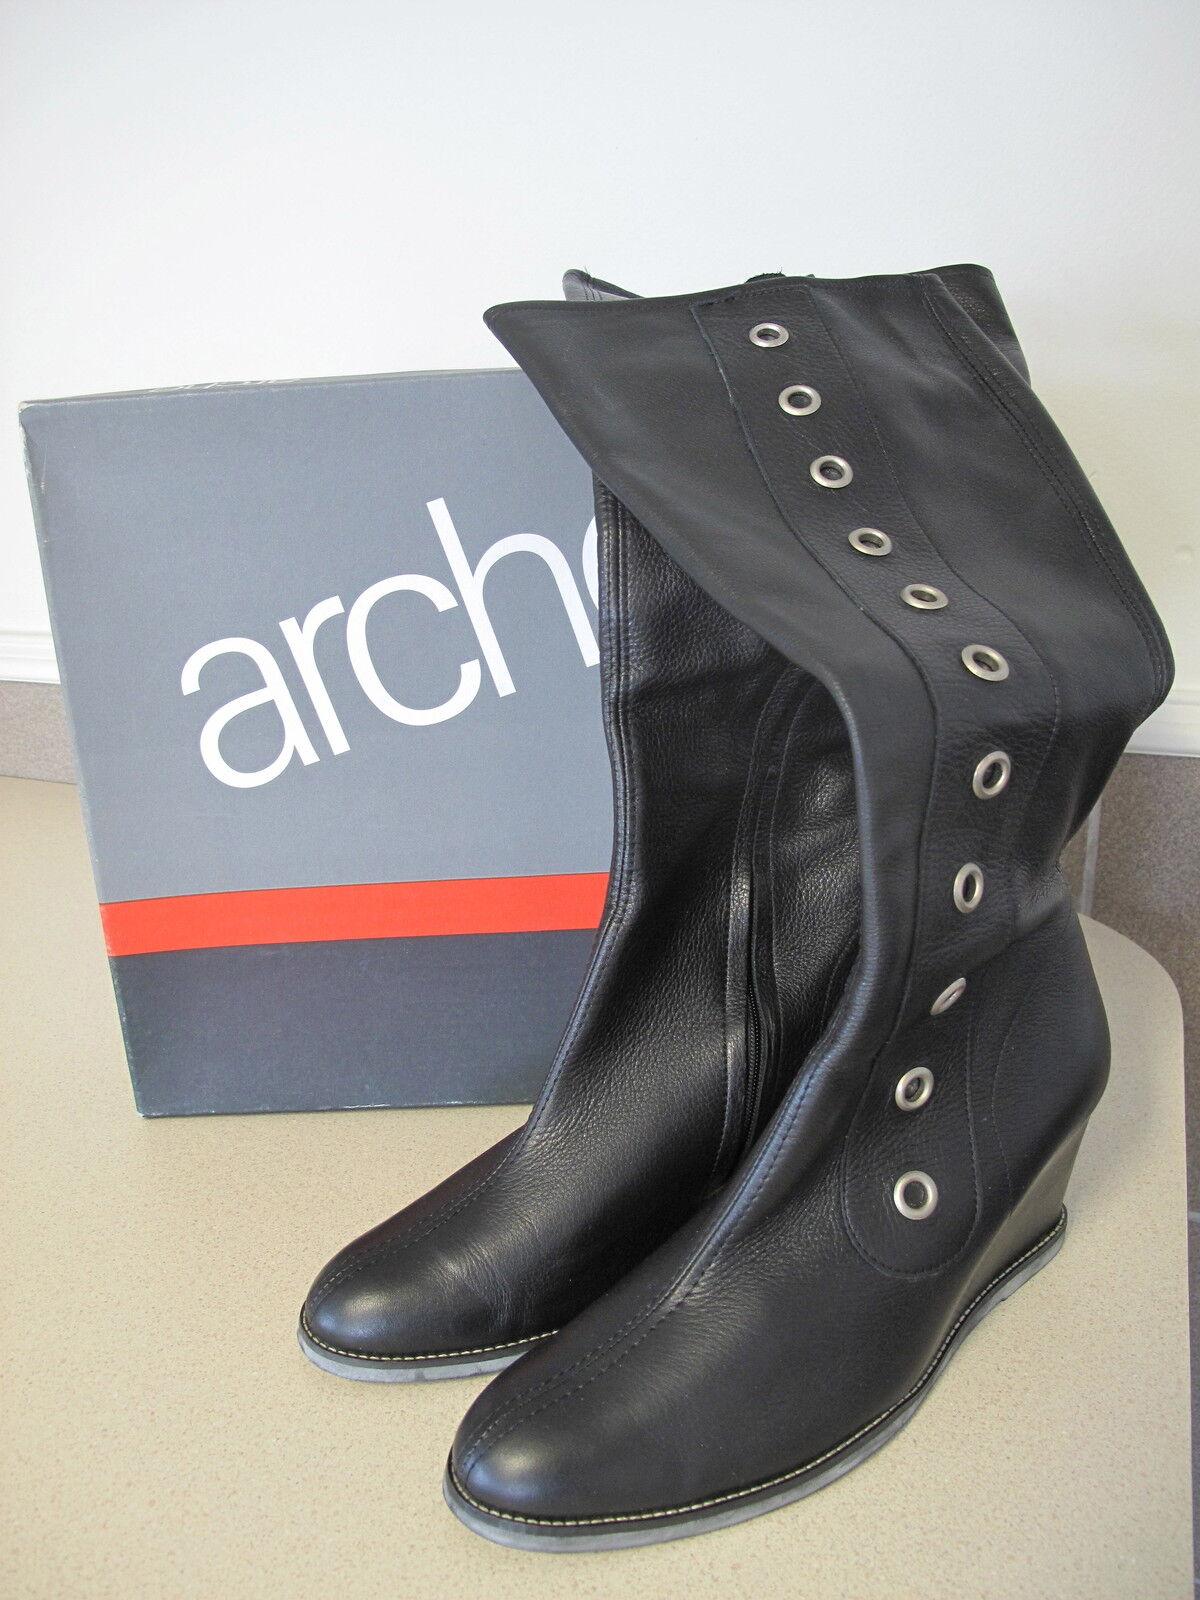 Women's ARCHE Boots Black Platform sz 8 Eur 39 made FRANCE in Box